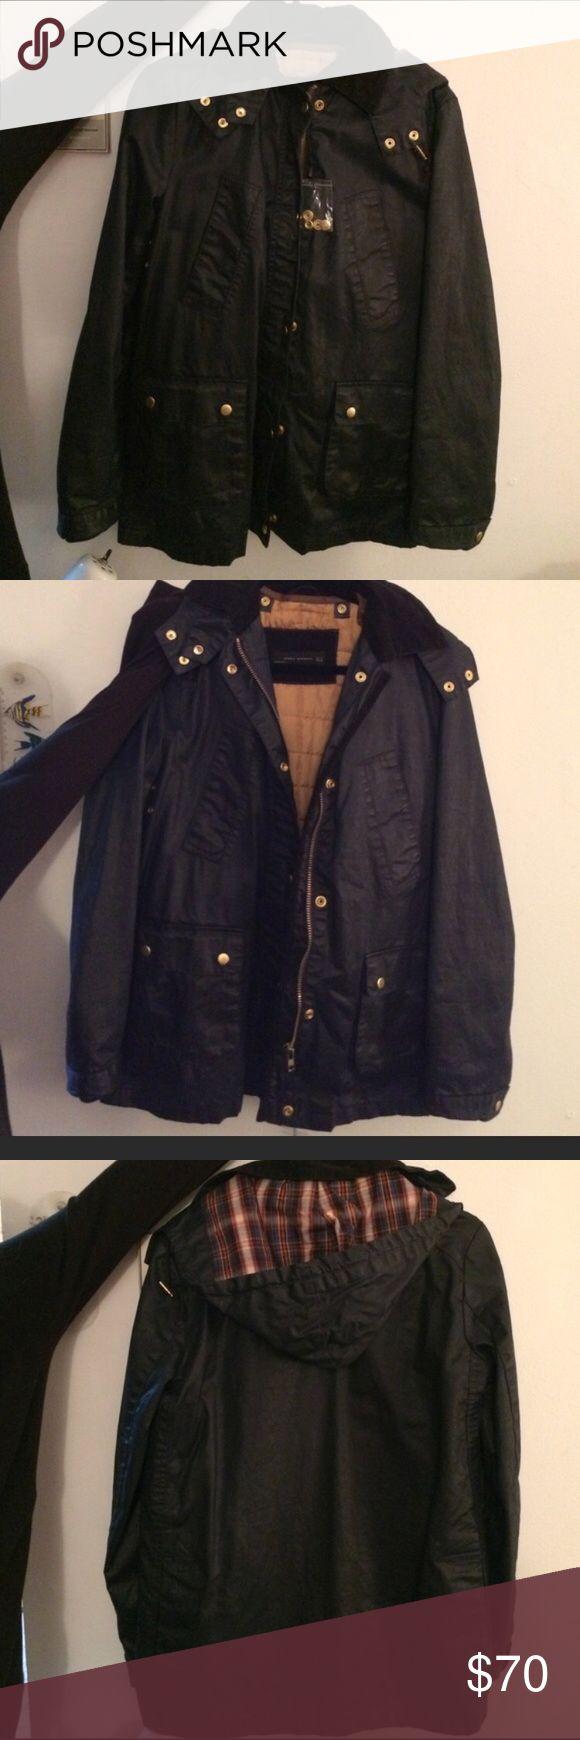 "Zara woman waxed jacket navy blue Never worn without tag . Navy blue waxed jacket gold buttons. Removable insert and hood. Bust 40"", 25"" length sleeve, 28""length, 17""across shoulders. Zara Jackets & Coats Utility Jackets"